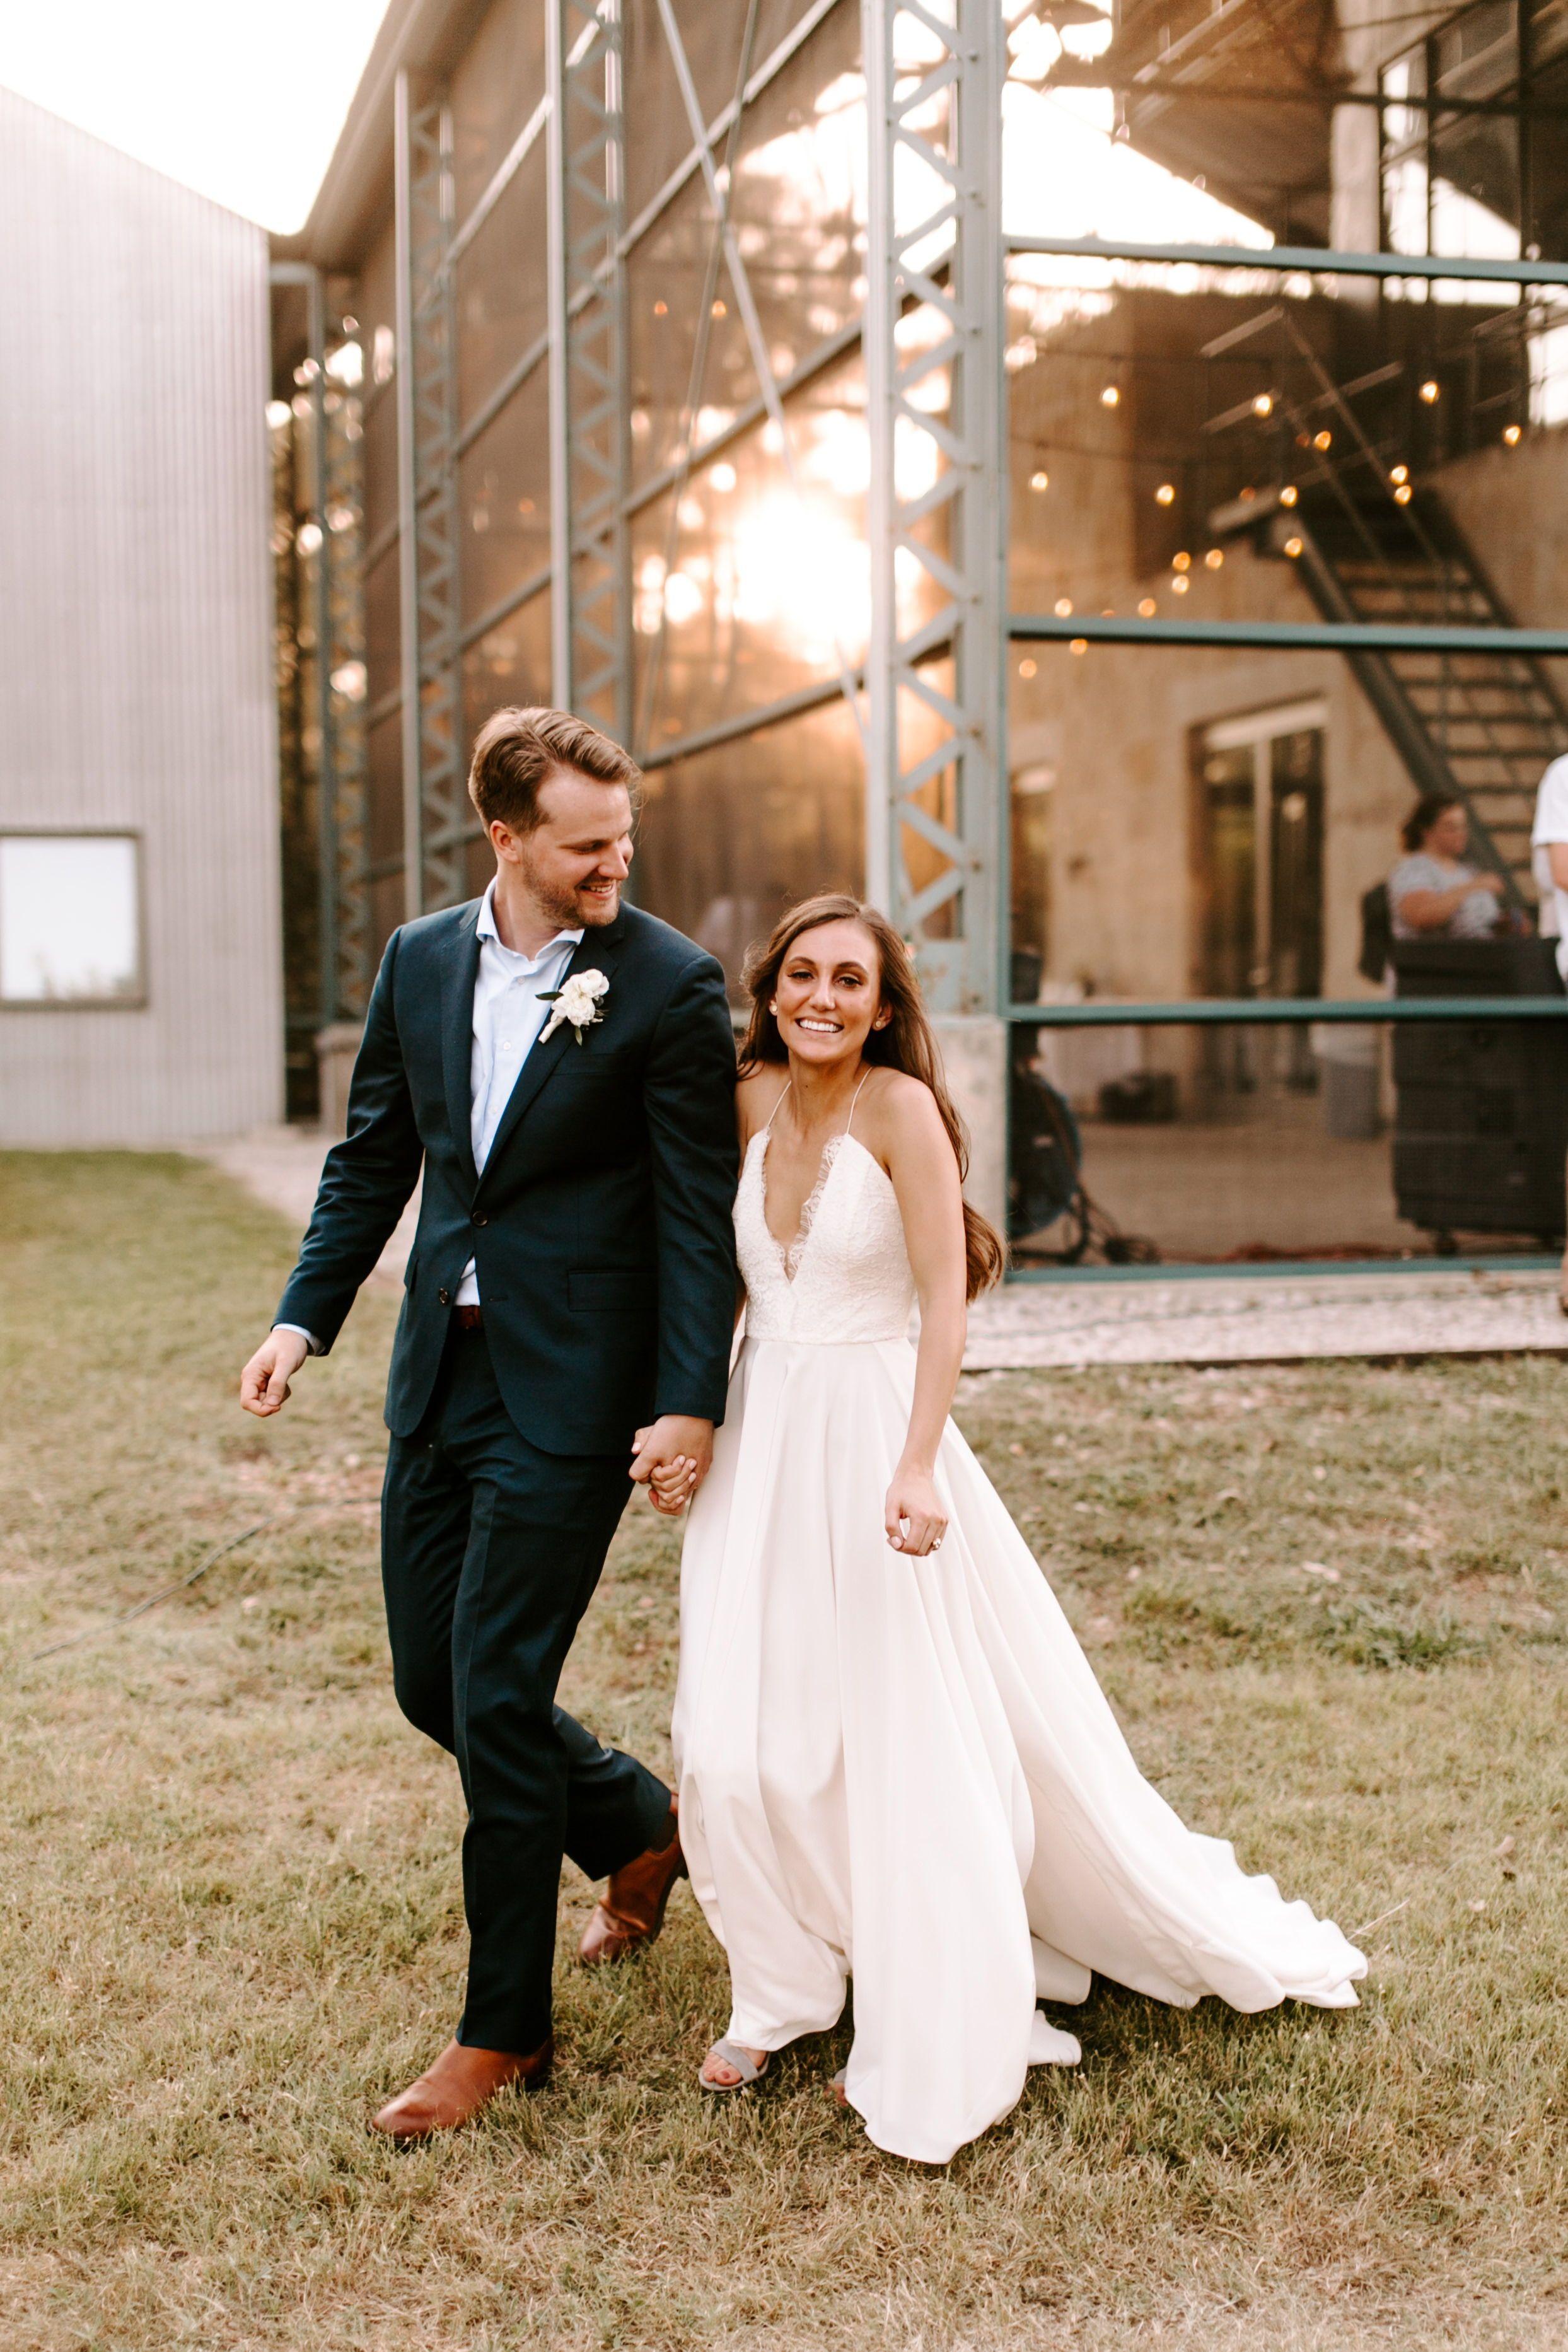 Real Wedding Kristina Grayson Simple Elegant Outdoor Wedding A Be Bridal Shop Outdoor Wedding Dress Wedding Dresses Elegant Wedding Dresses Lace